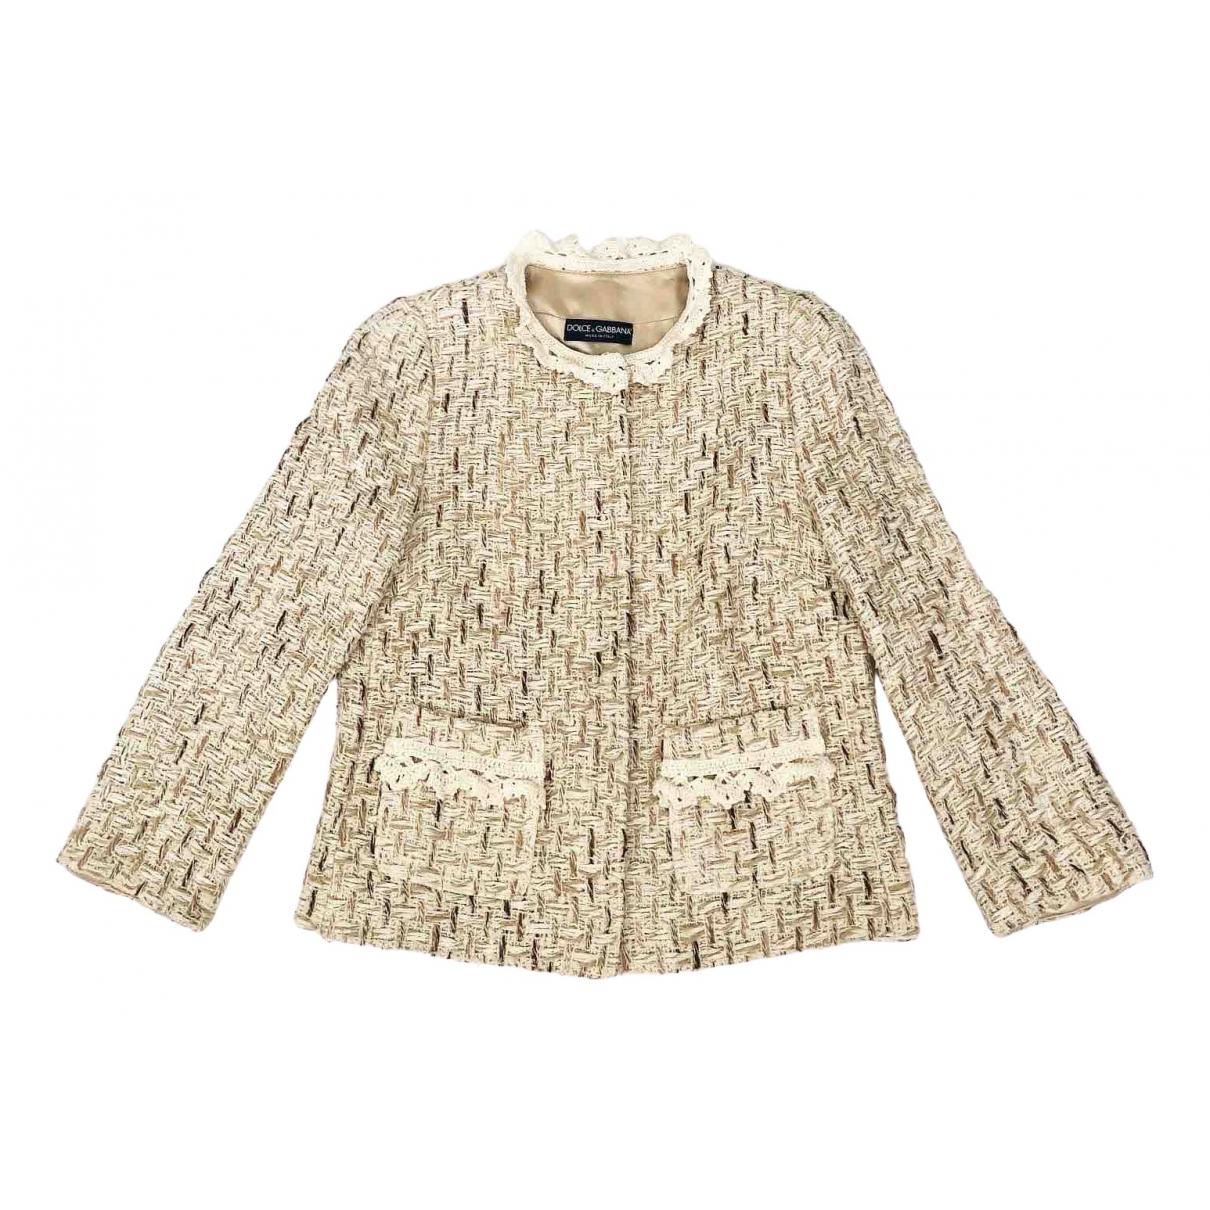 Dolce & Gabbana - Veste   pour femme en tweed - beige